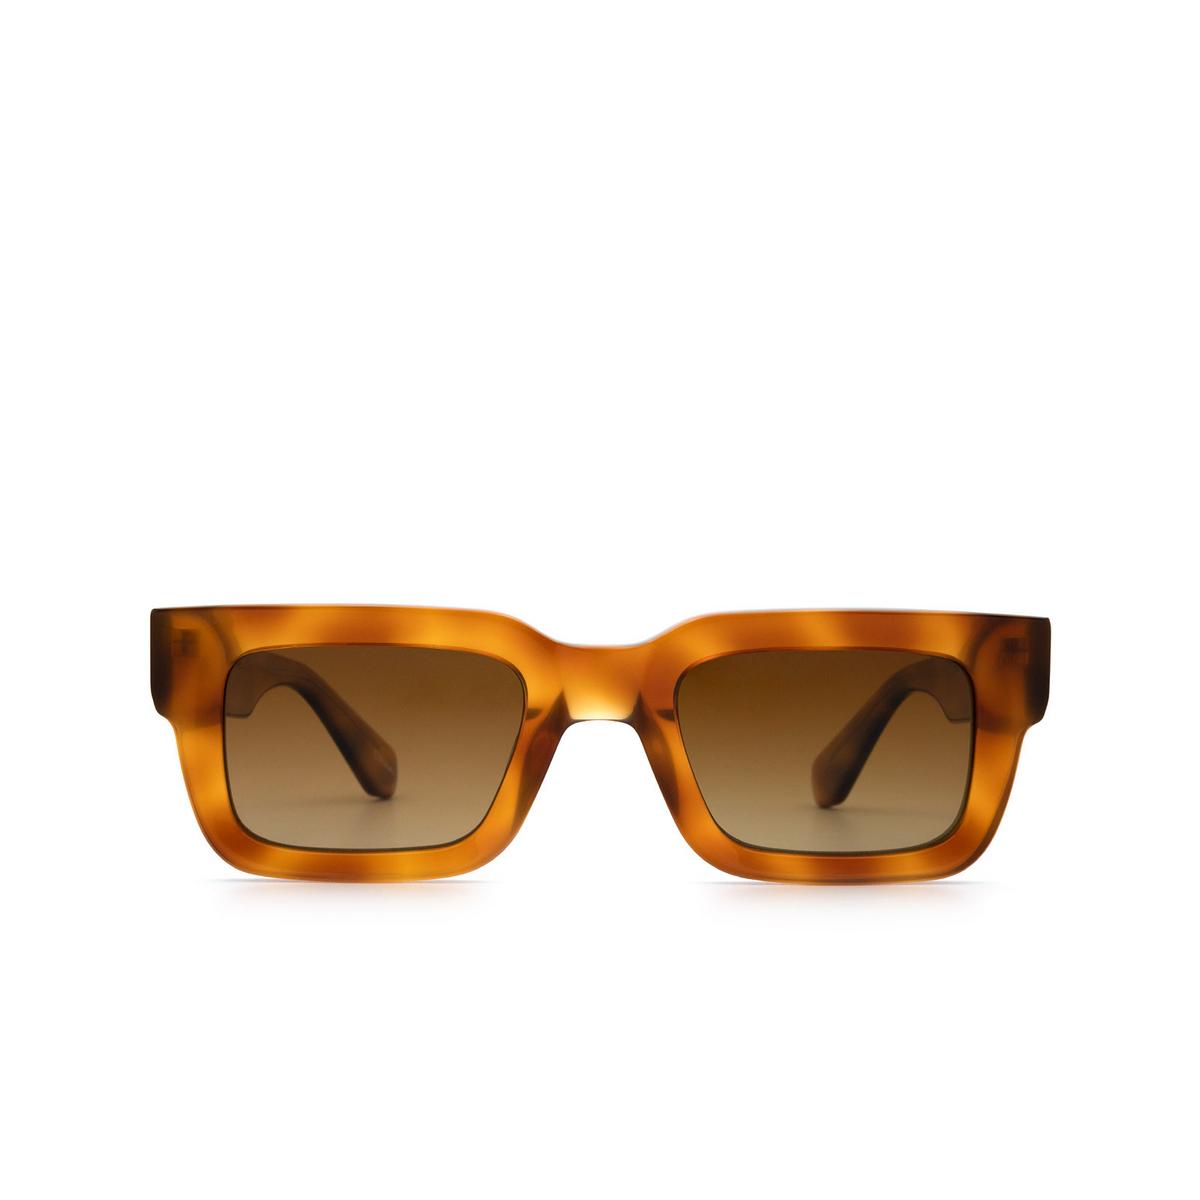 Chimi® Rectangle Sunglasses: 05 color Havana - front view.